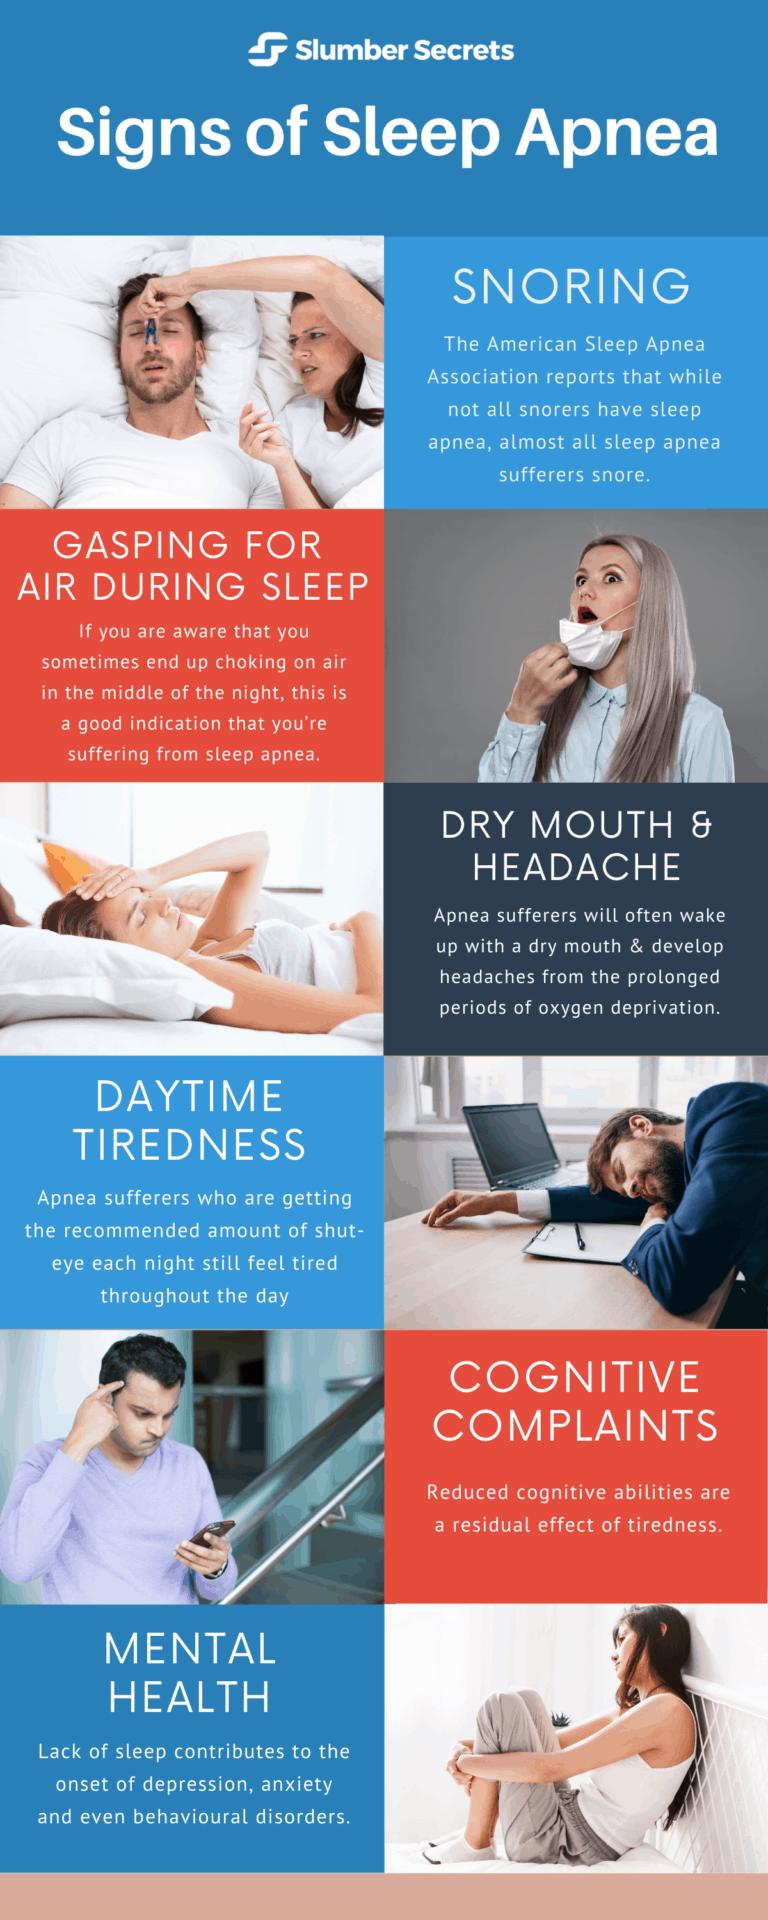 signs-of-sleep-apnea-infographic